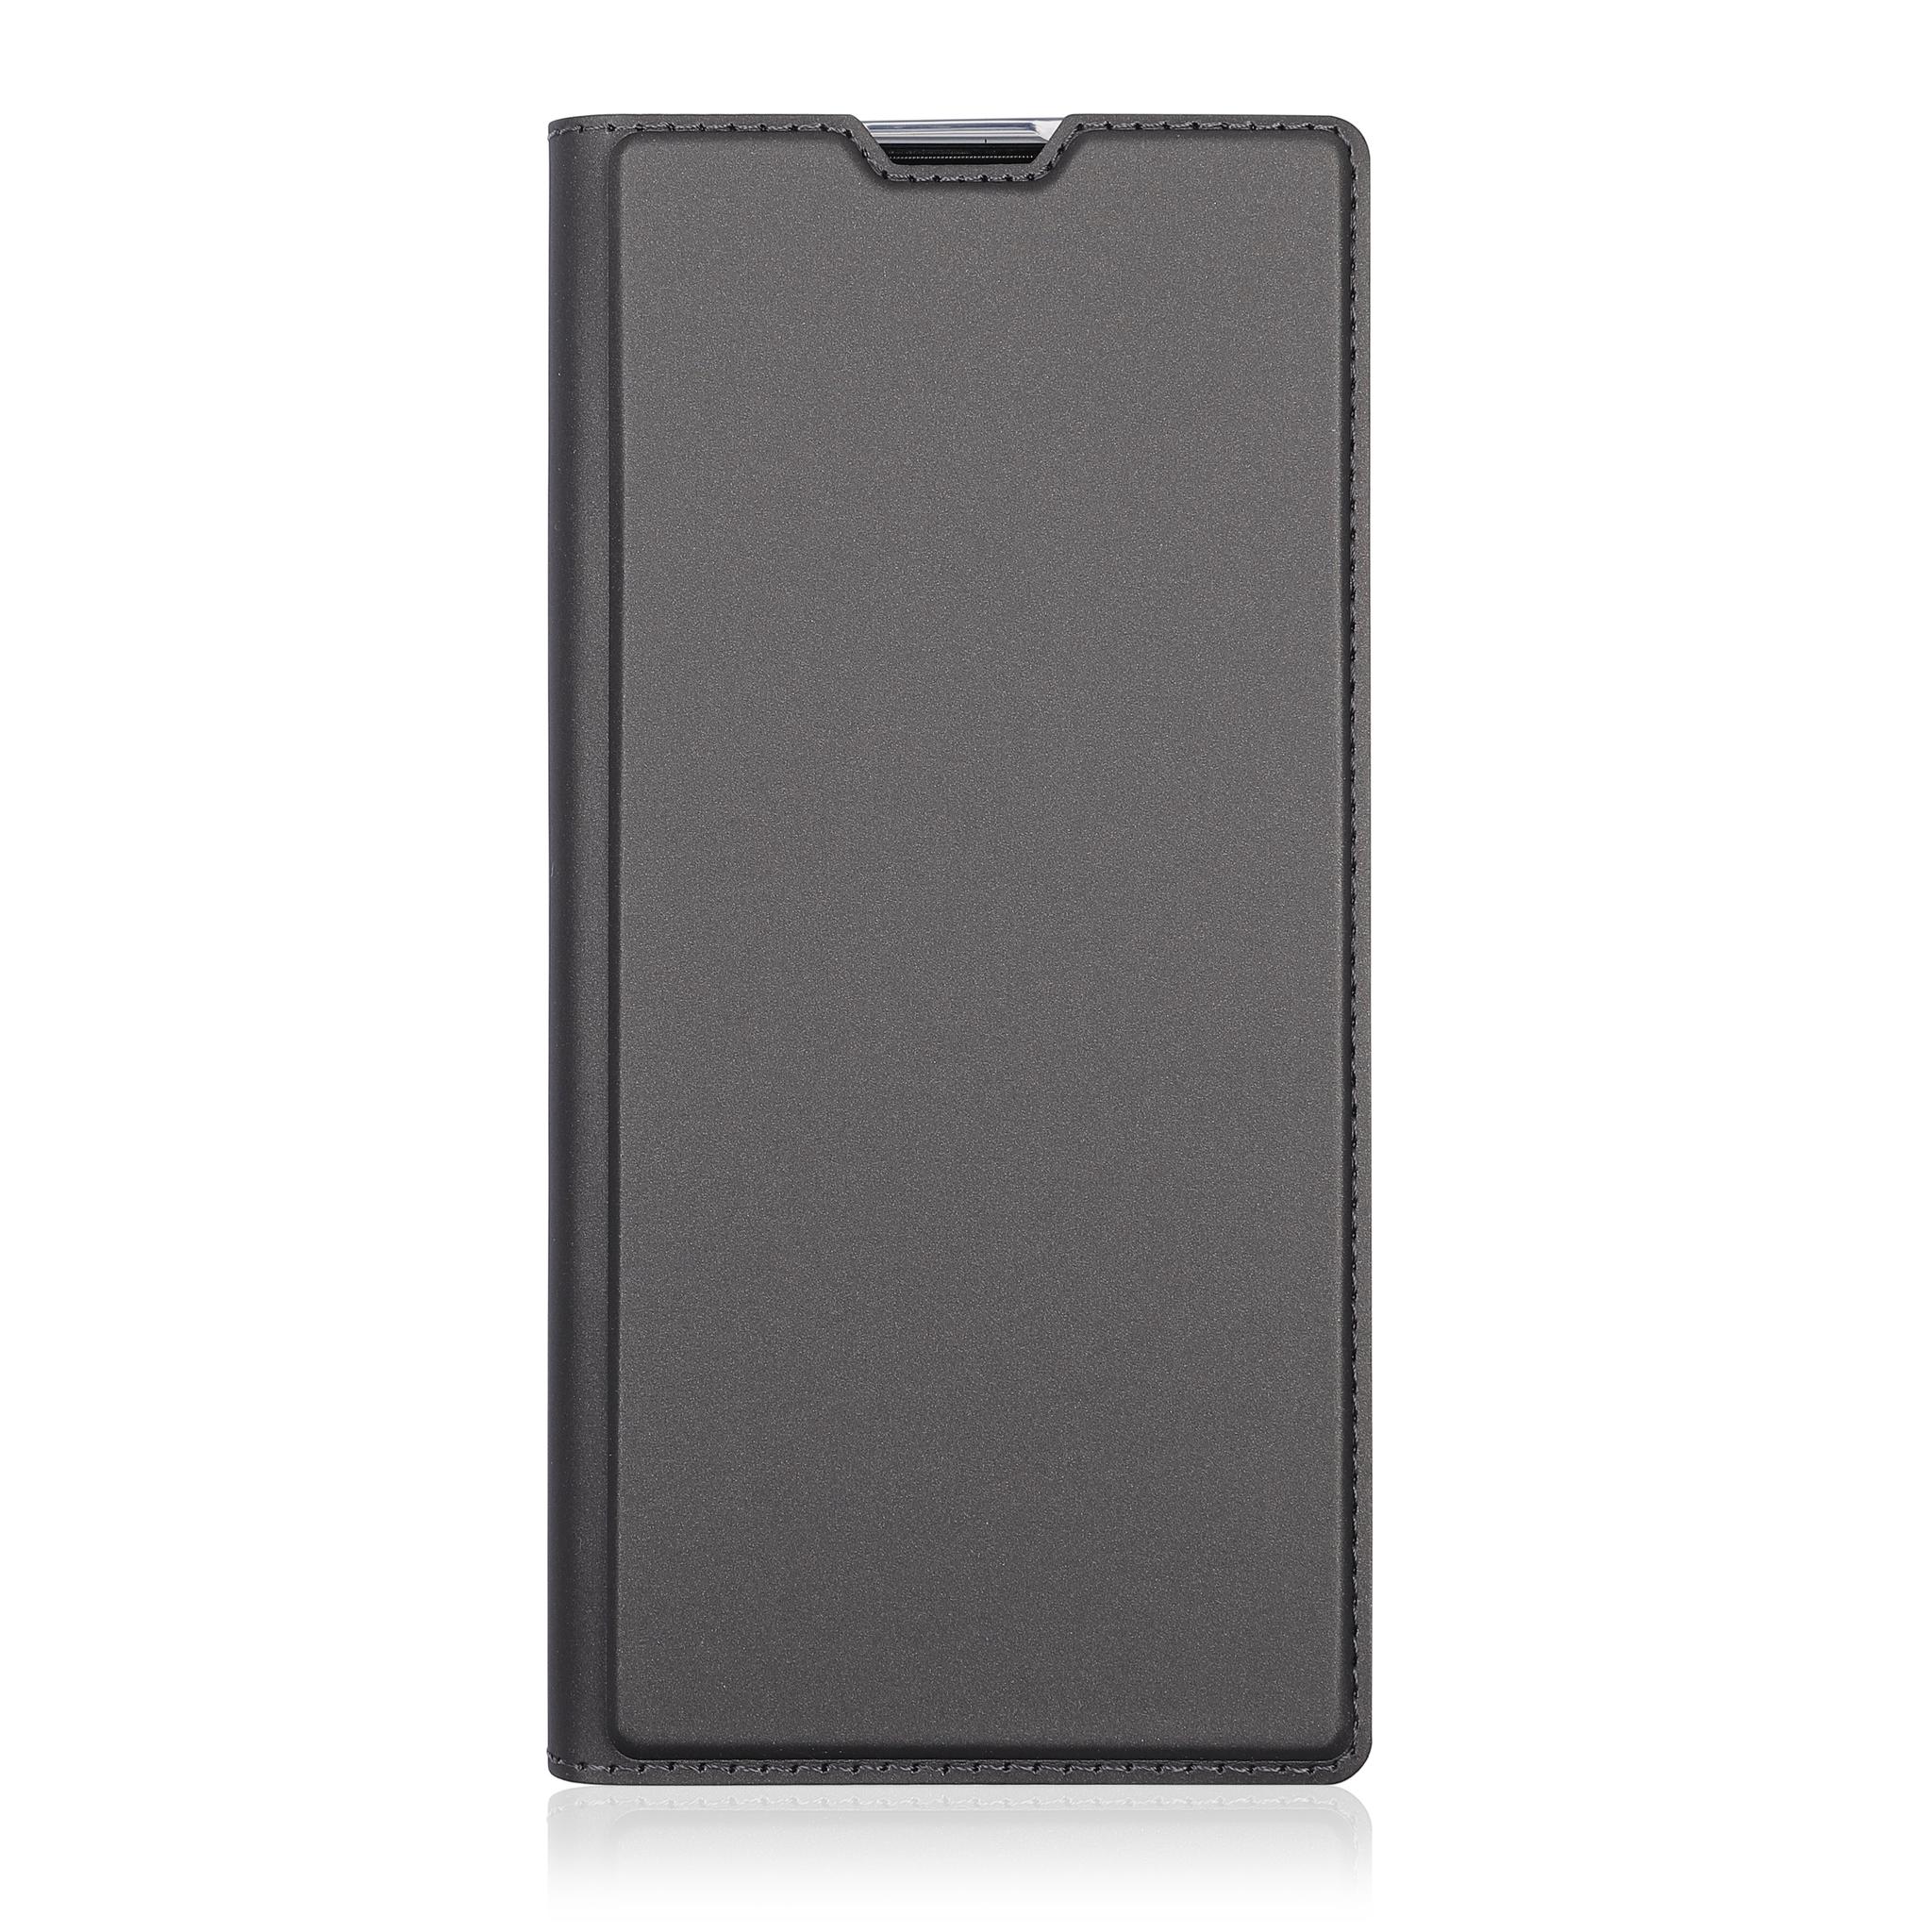 Чехол-книжка чёрного цвета для Xperia XA2 Plus в Sony Centre Воронеж